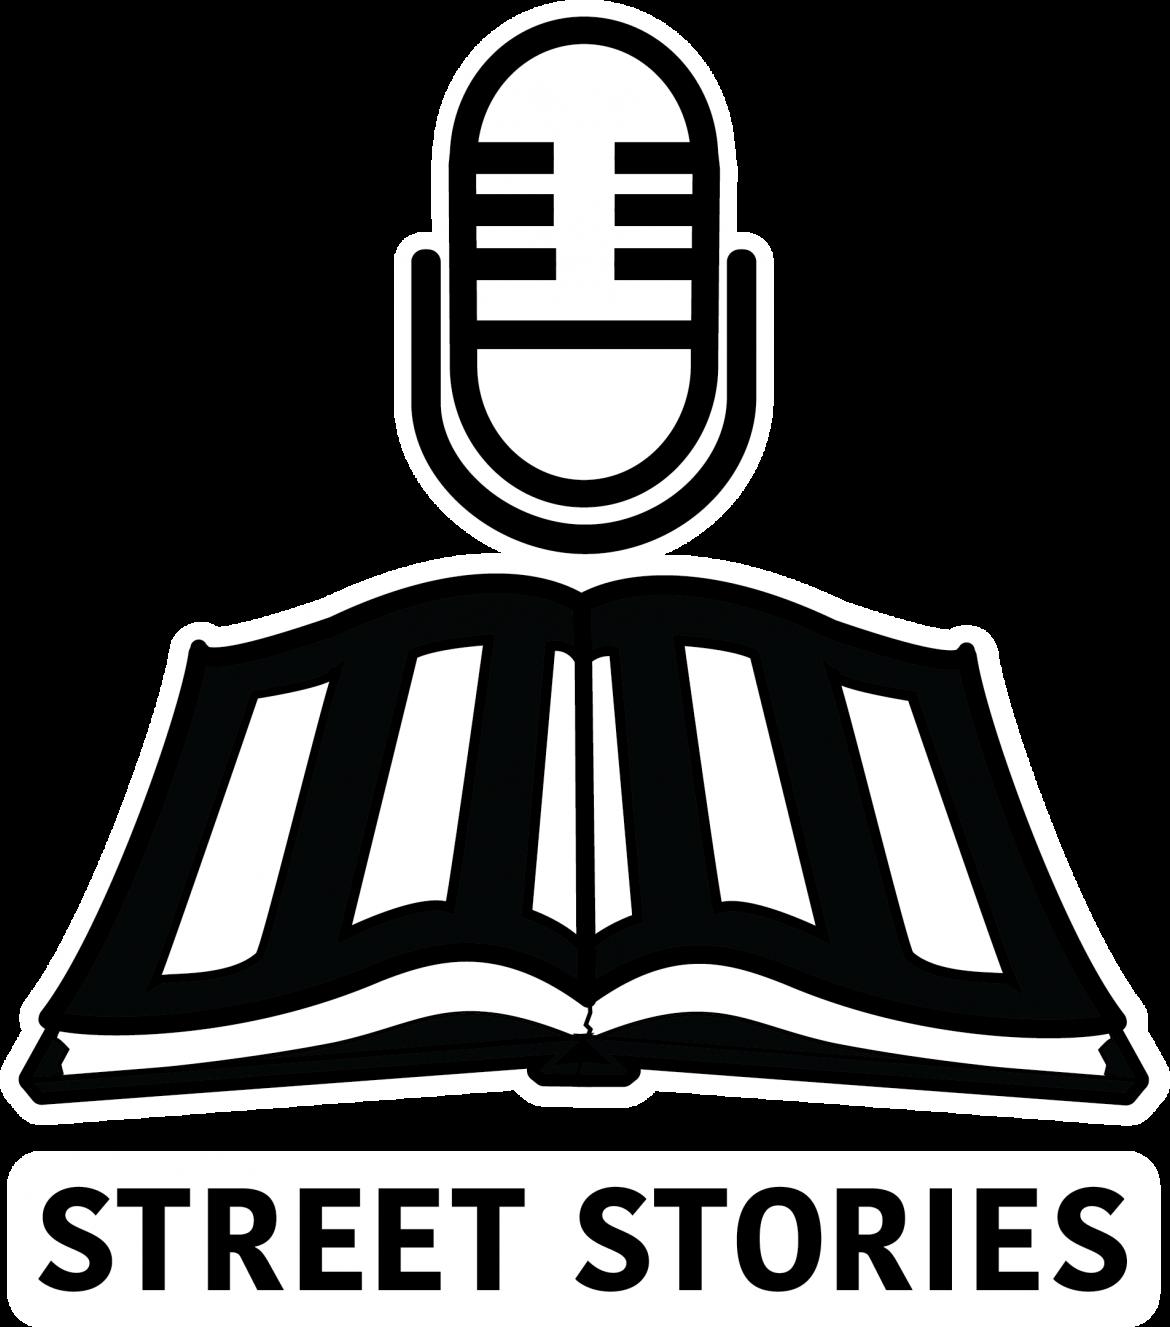 street stories logo